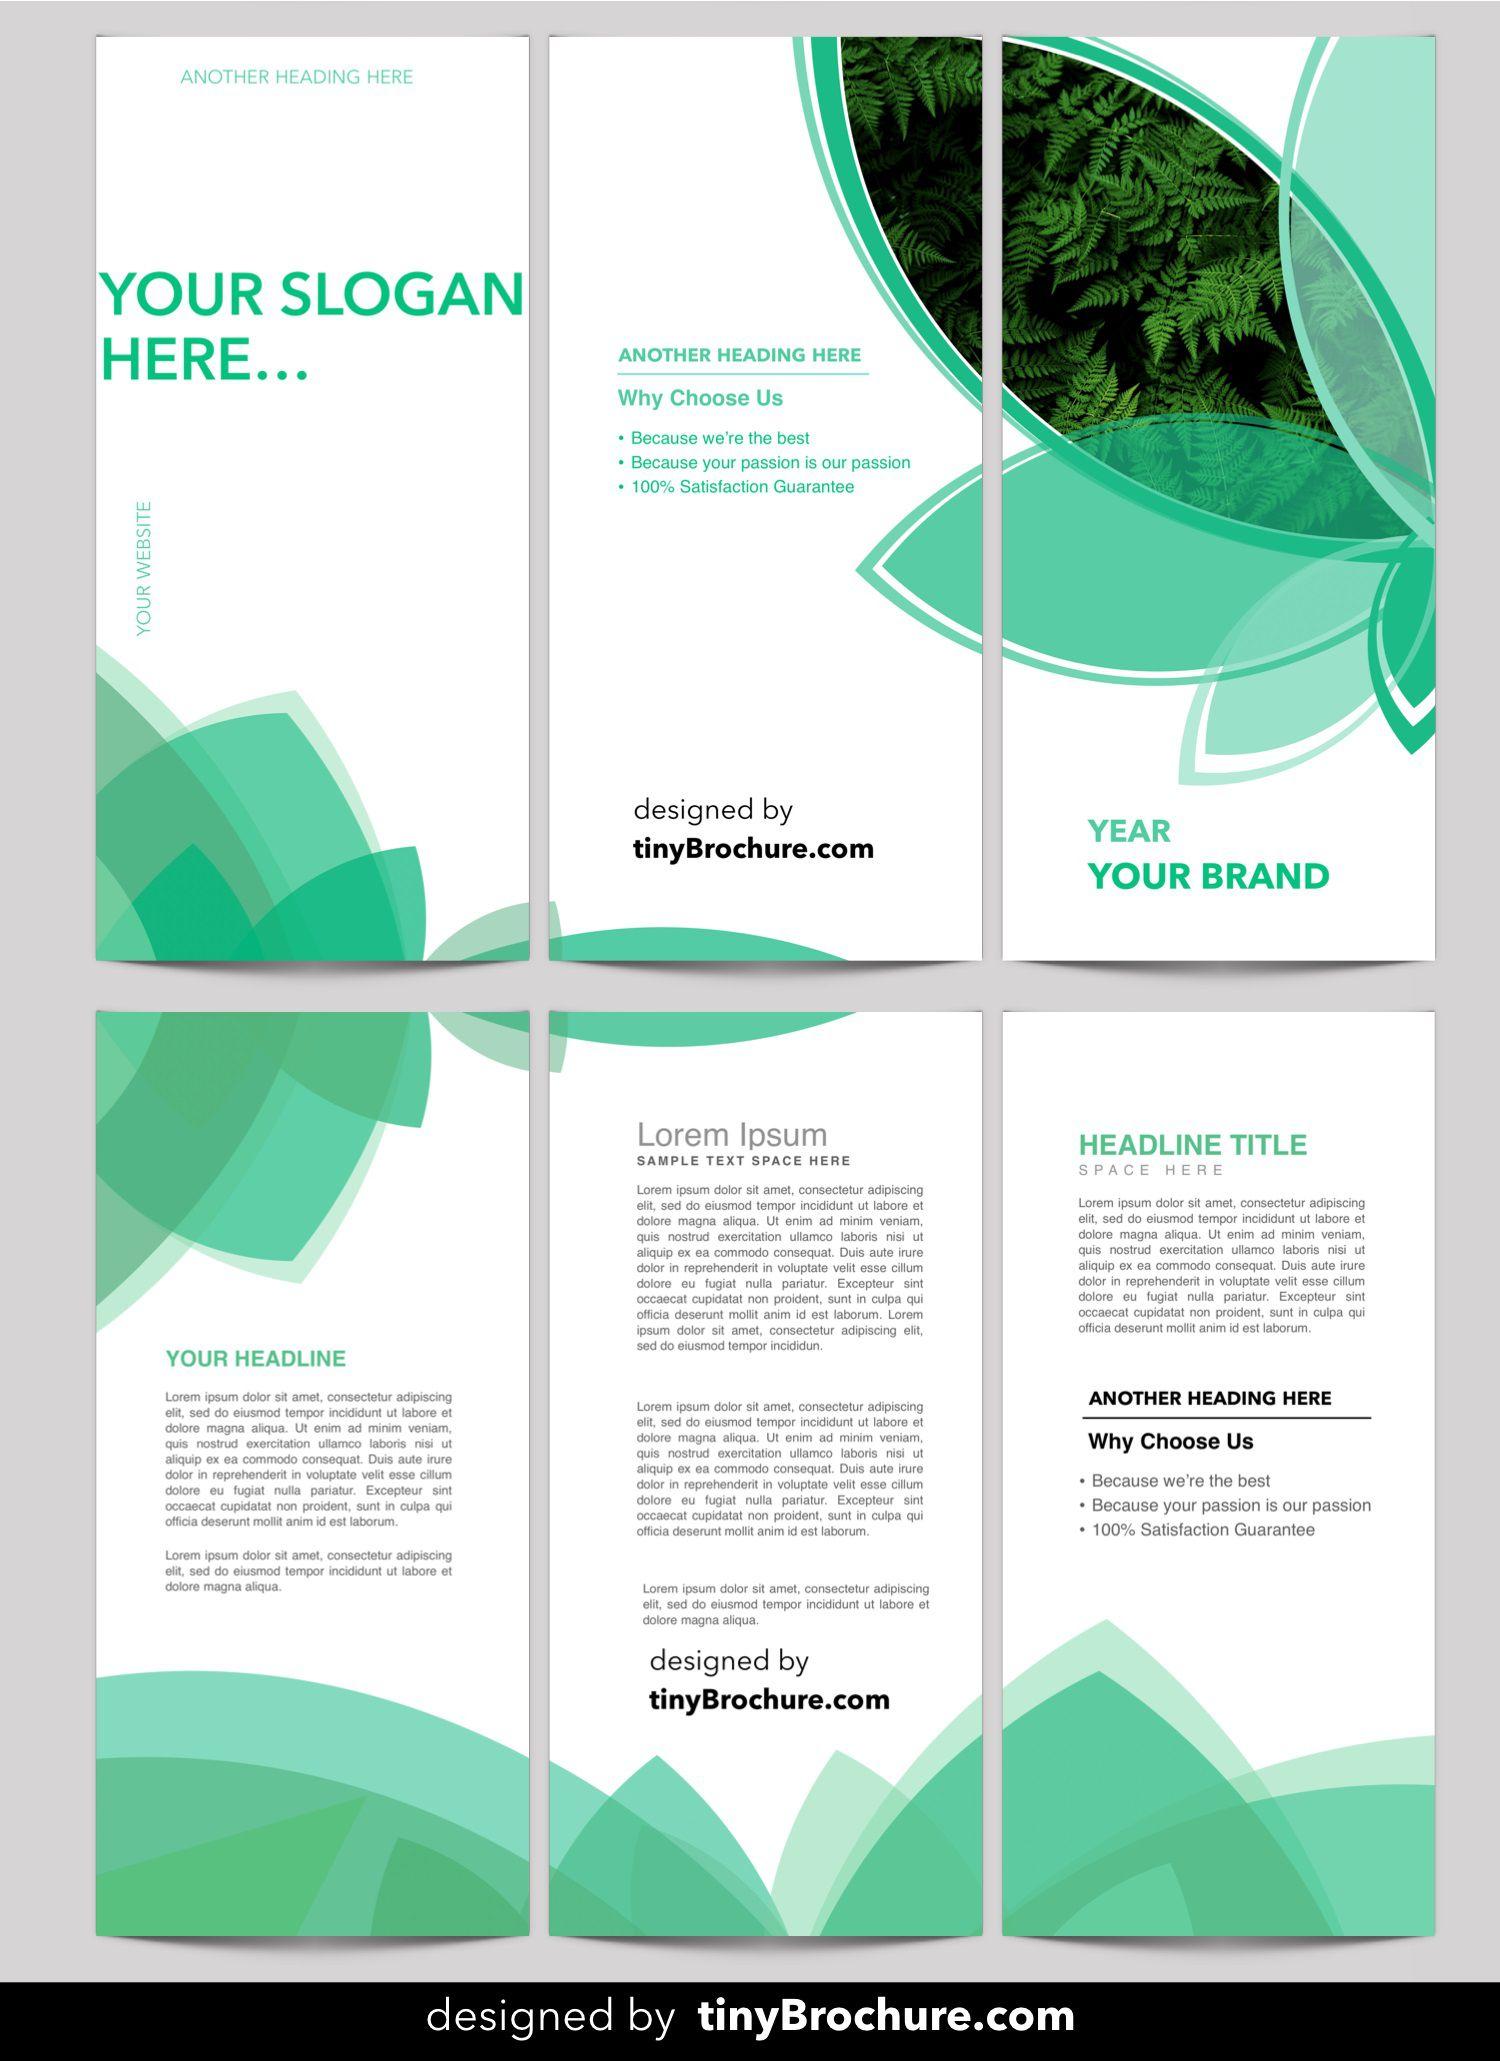 001 Unusual Microsoft Word Brochure Template Image  Templates 2010 Tri Fold A4 2007 Free DownloadFull